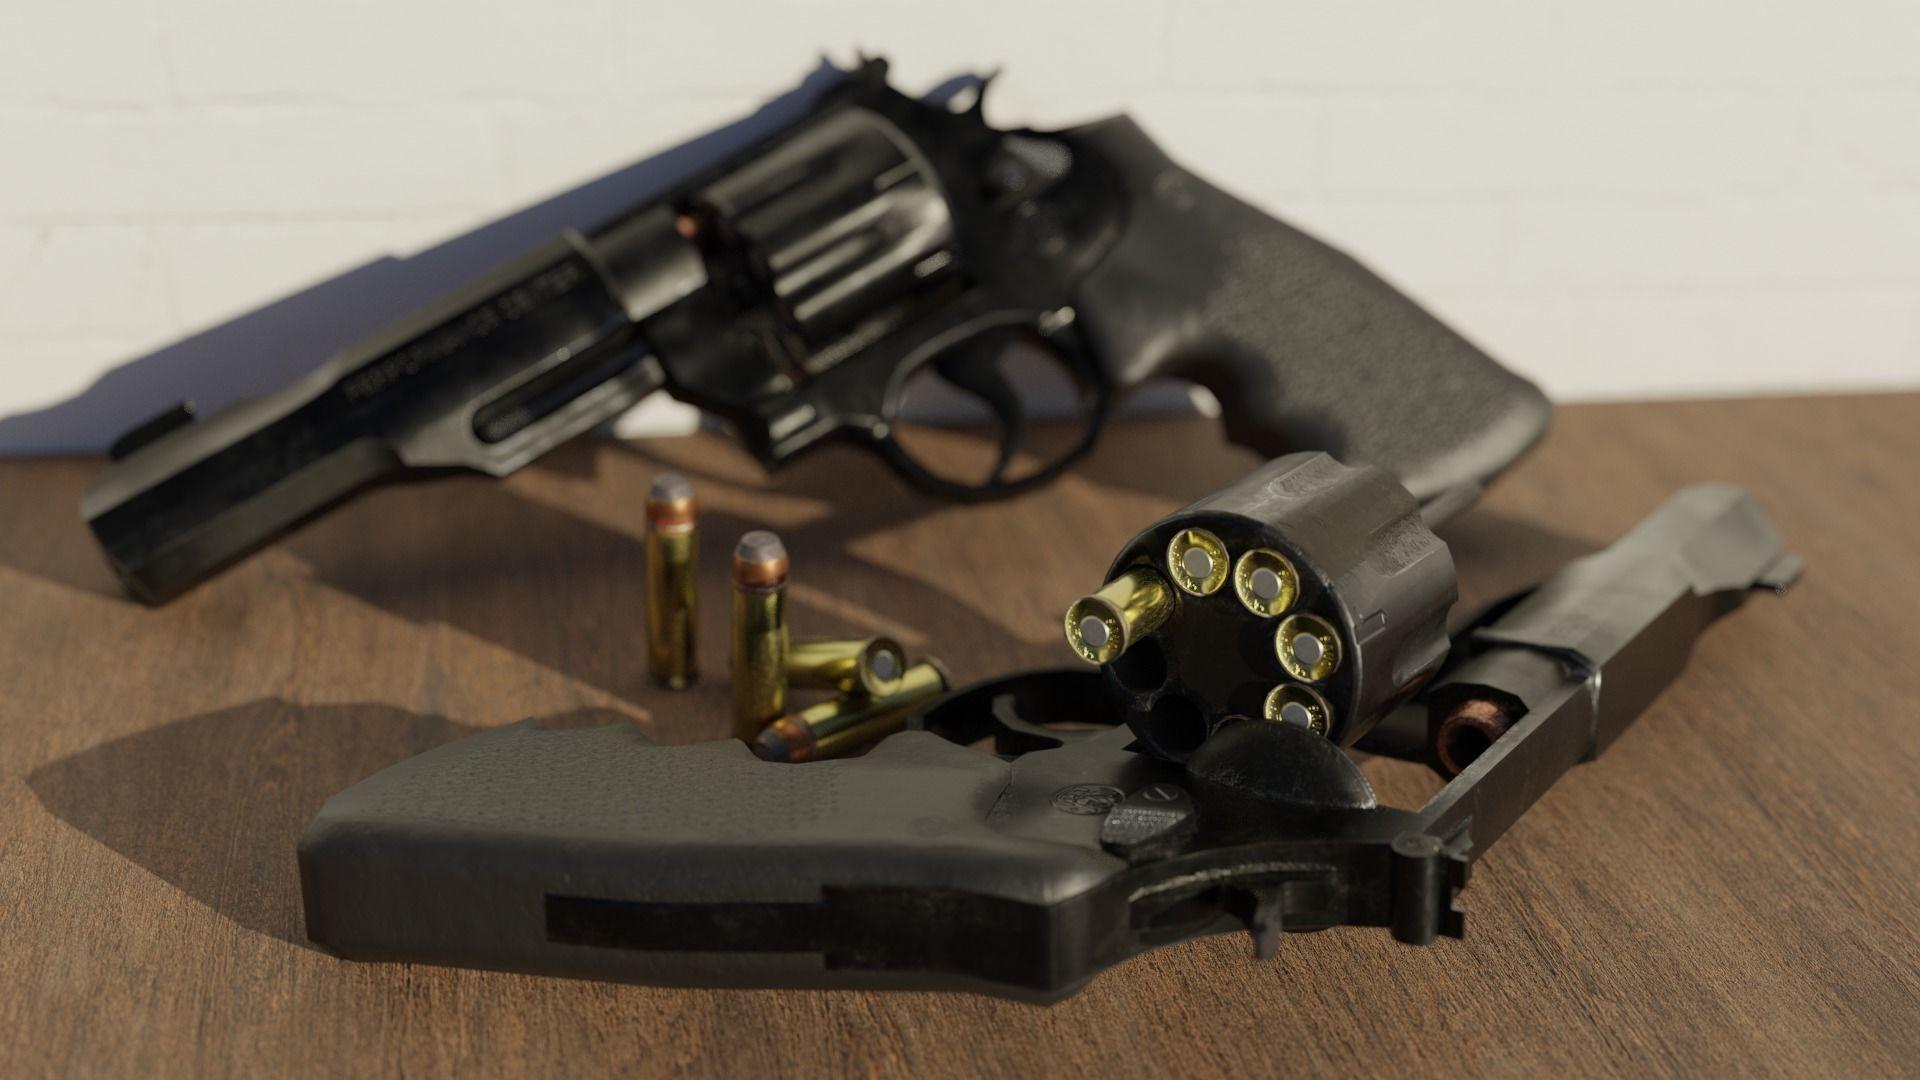 Revolver Magnum Pistol Trr8 357 caliber